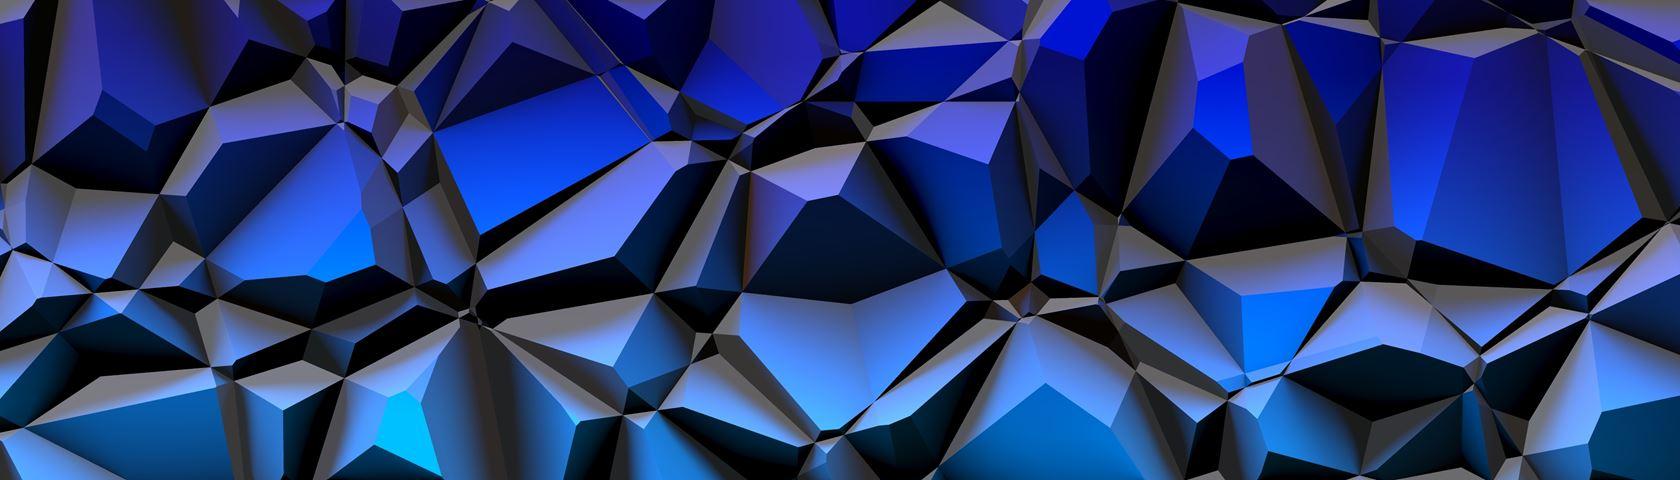 Polygon Blue